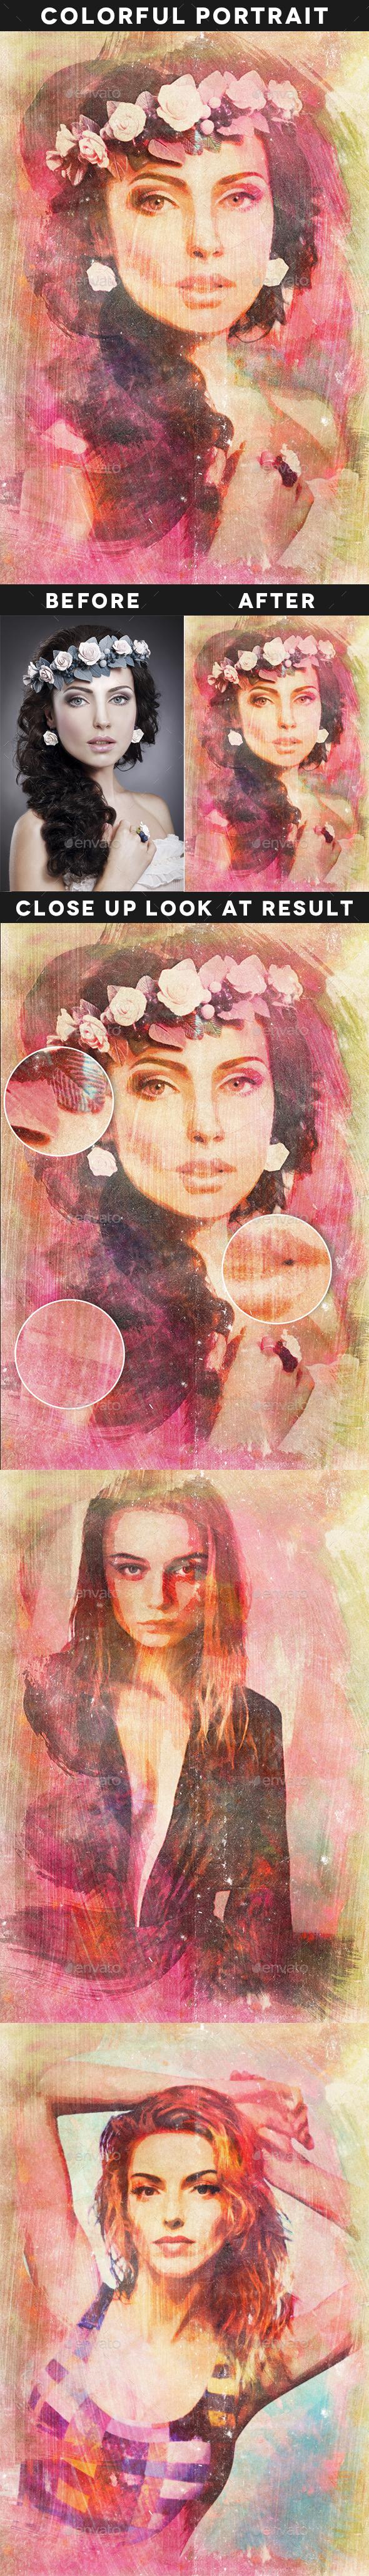 Creative Colorful Portrait - Artistic Photo Templates